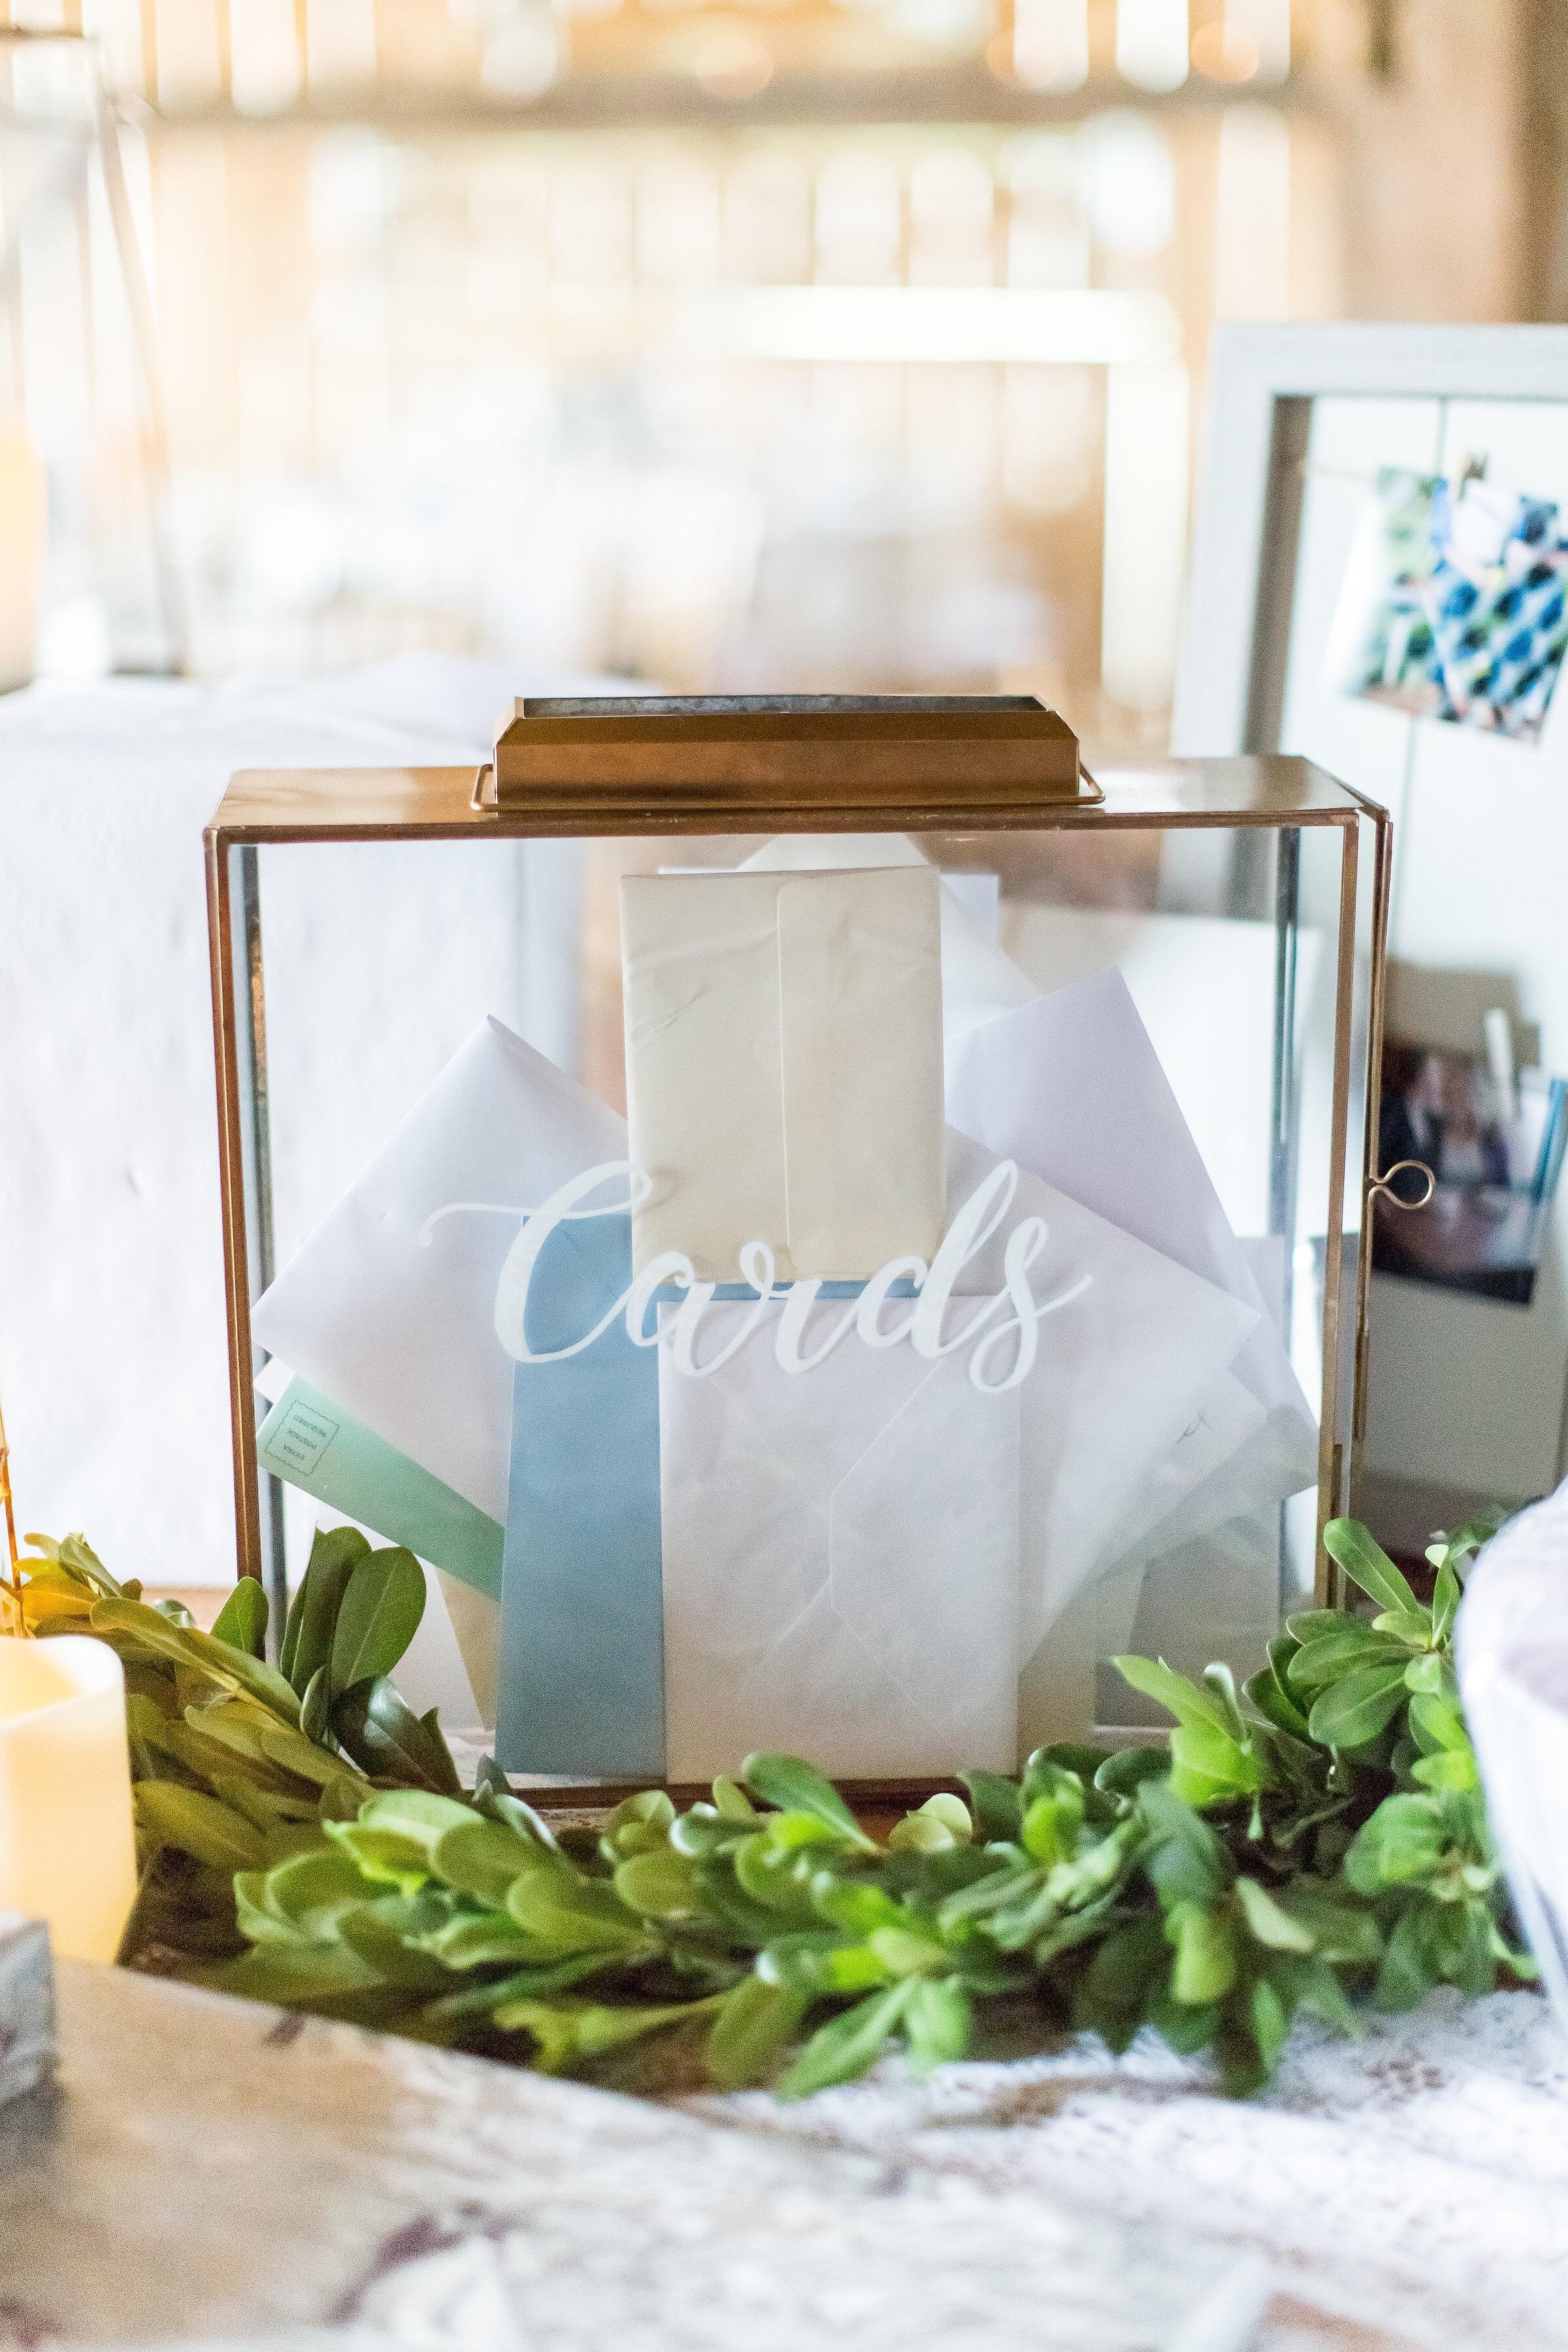 Glass & Copper card box $40